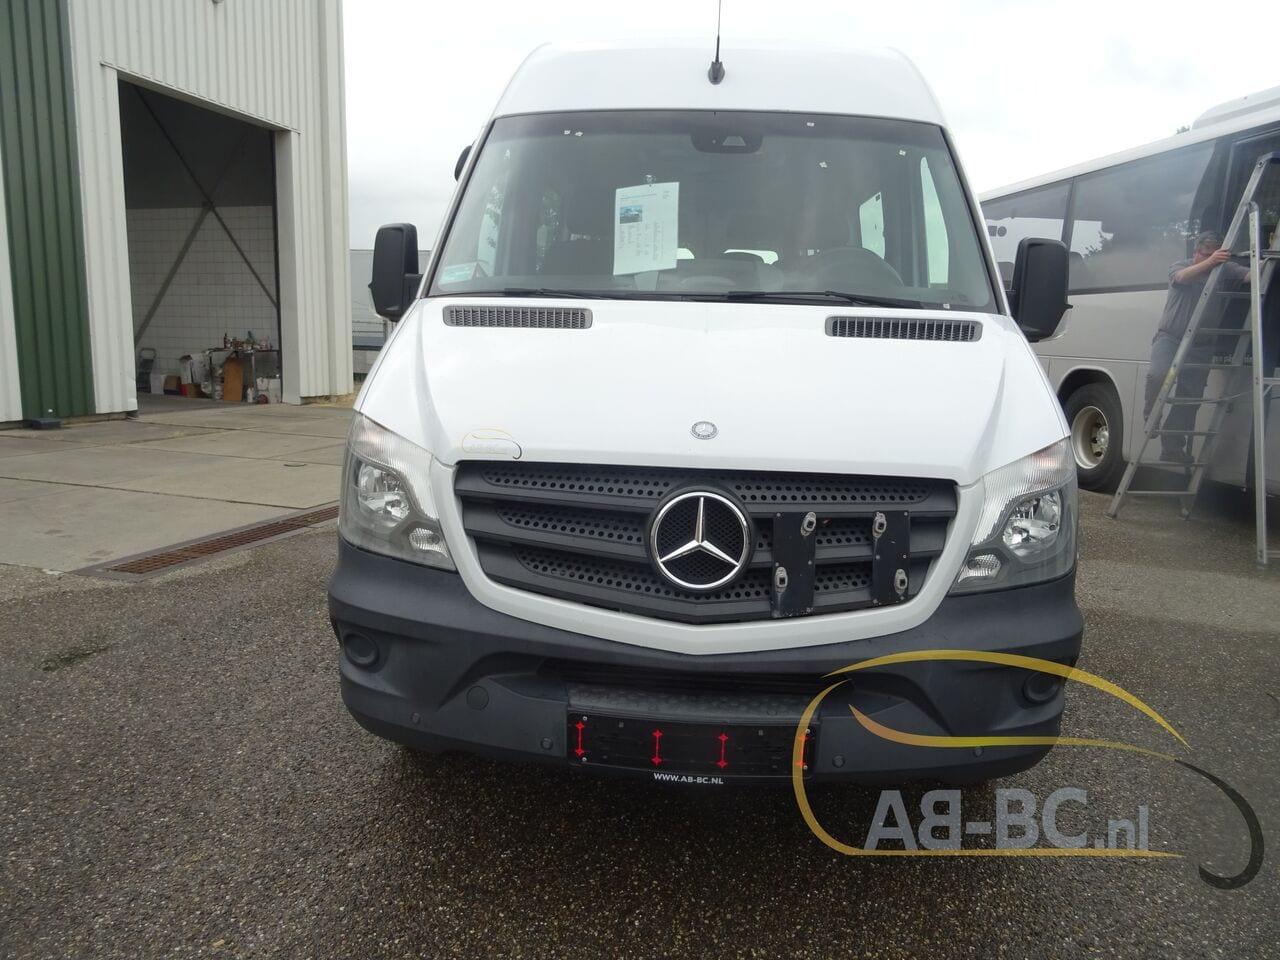 coach-busMERCEDES-BENZ-516-CDI-Sprinter-Transfer-45-23-Seats-EURO-6---1625493740951005369_big_ccb4e74736c076b97bf6fa865acc09bc--21060112394245379500